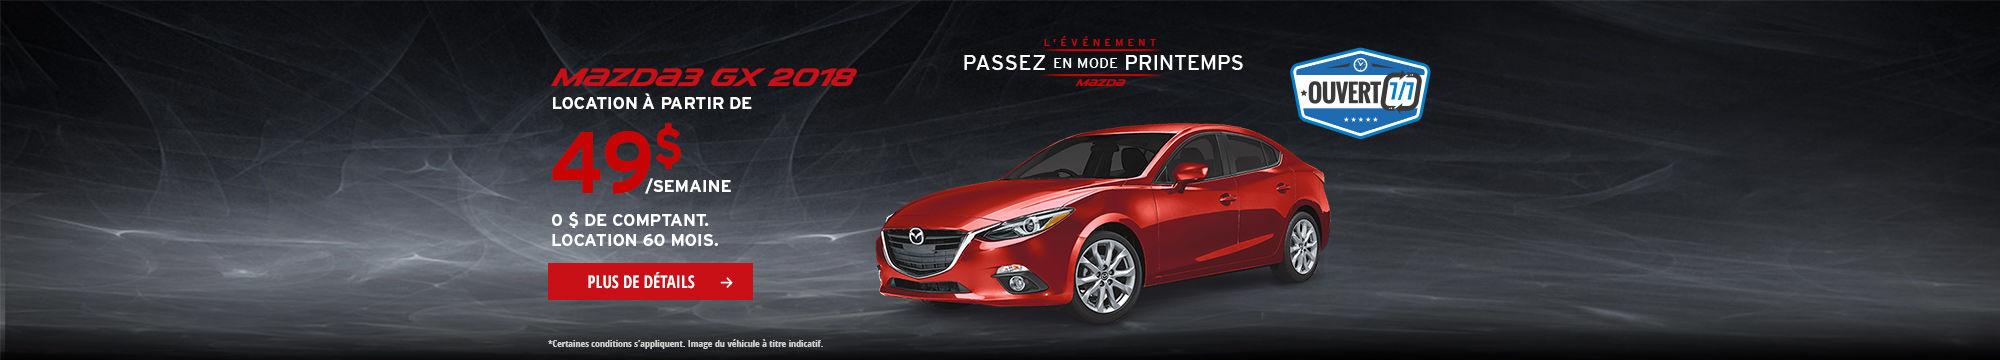 L'Événement Passez en mode printemps - Mazda3